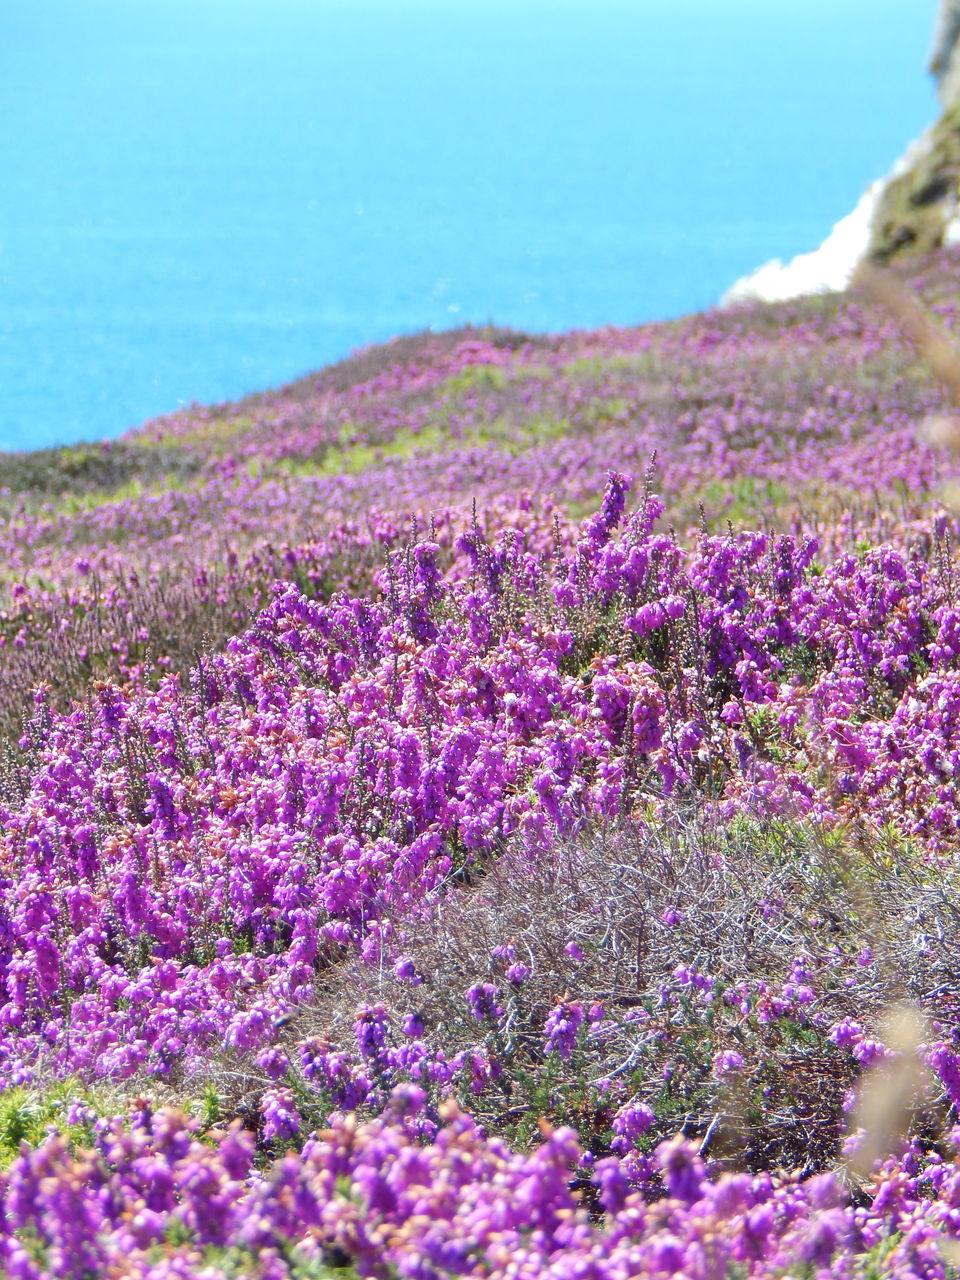 Purple Flowers Growing On Field Against Sea